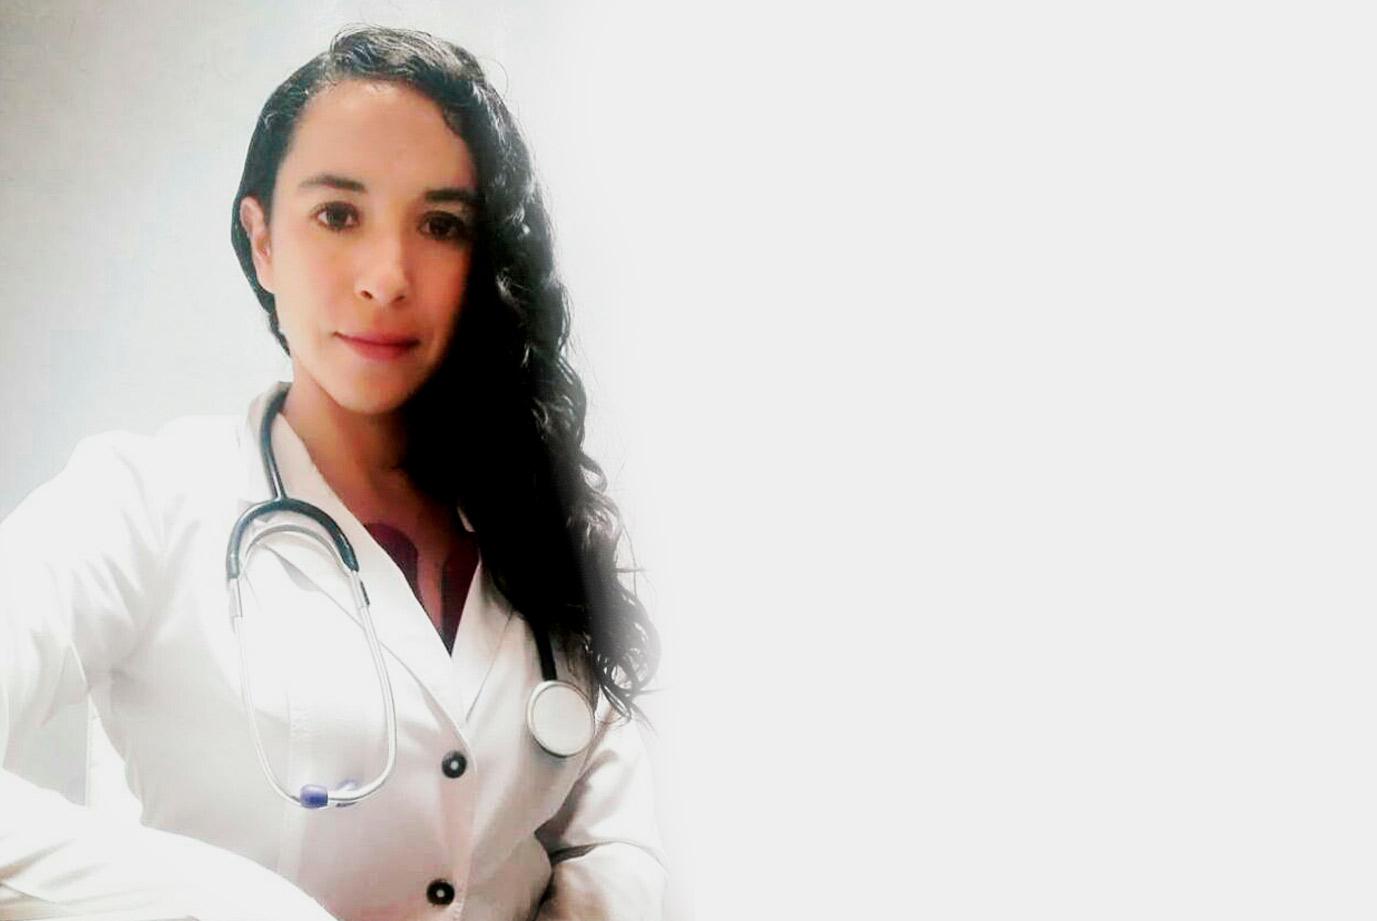 Dra. Michelle Cruz de la Garza